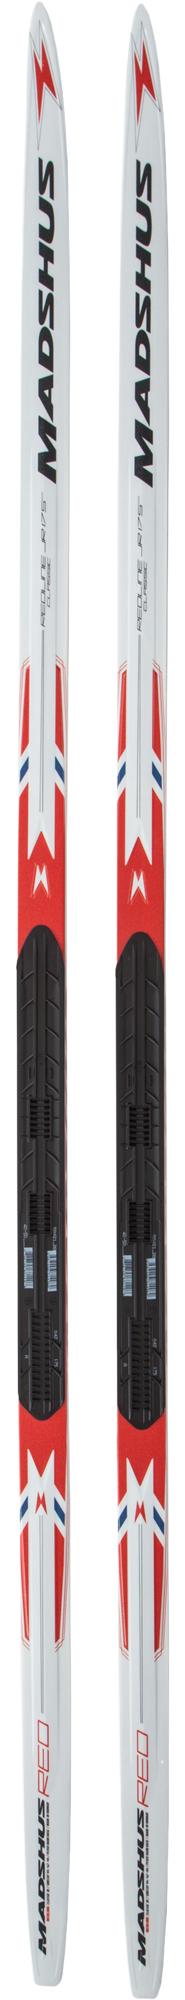 Madshus Беговые лыжи юниорские Madshus Line Carbon Classic Jr лыжи беговые tisa top classic n90415